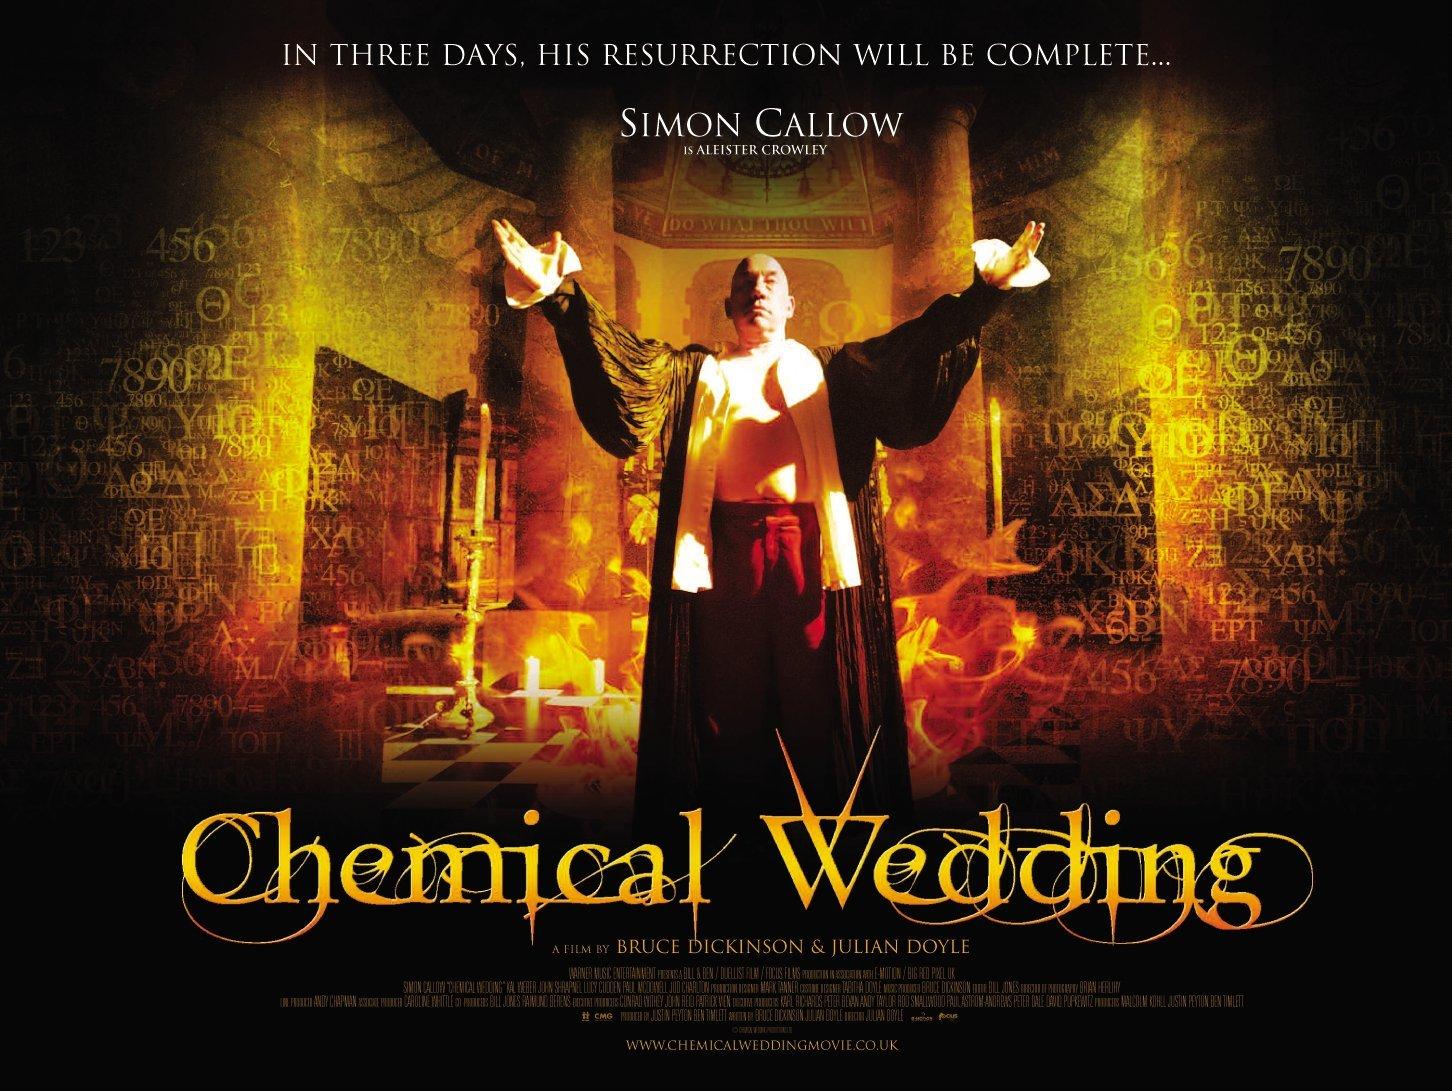 Filme Chemical Wedding – Videoteca Hermética